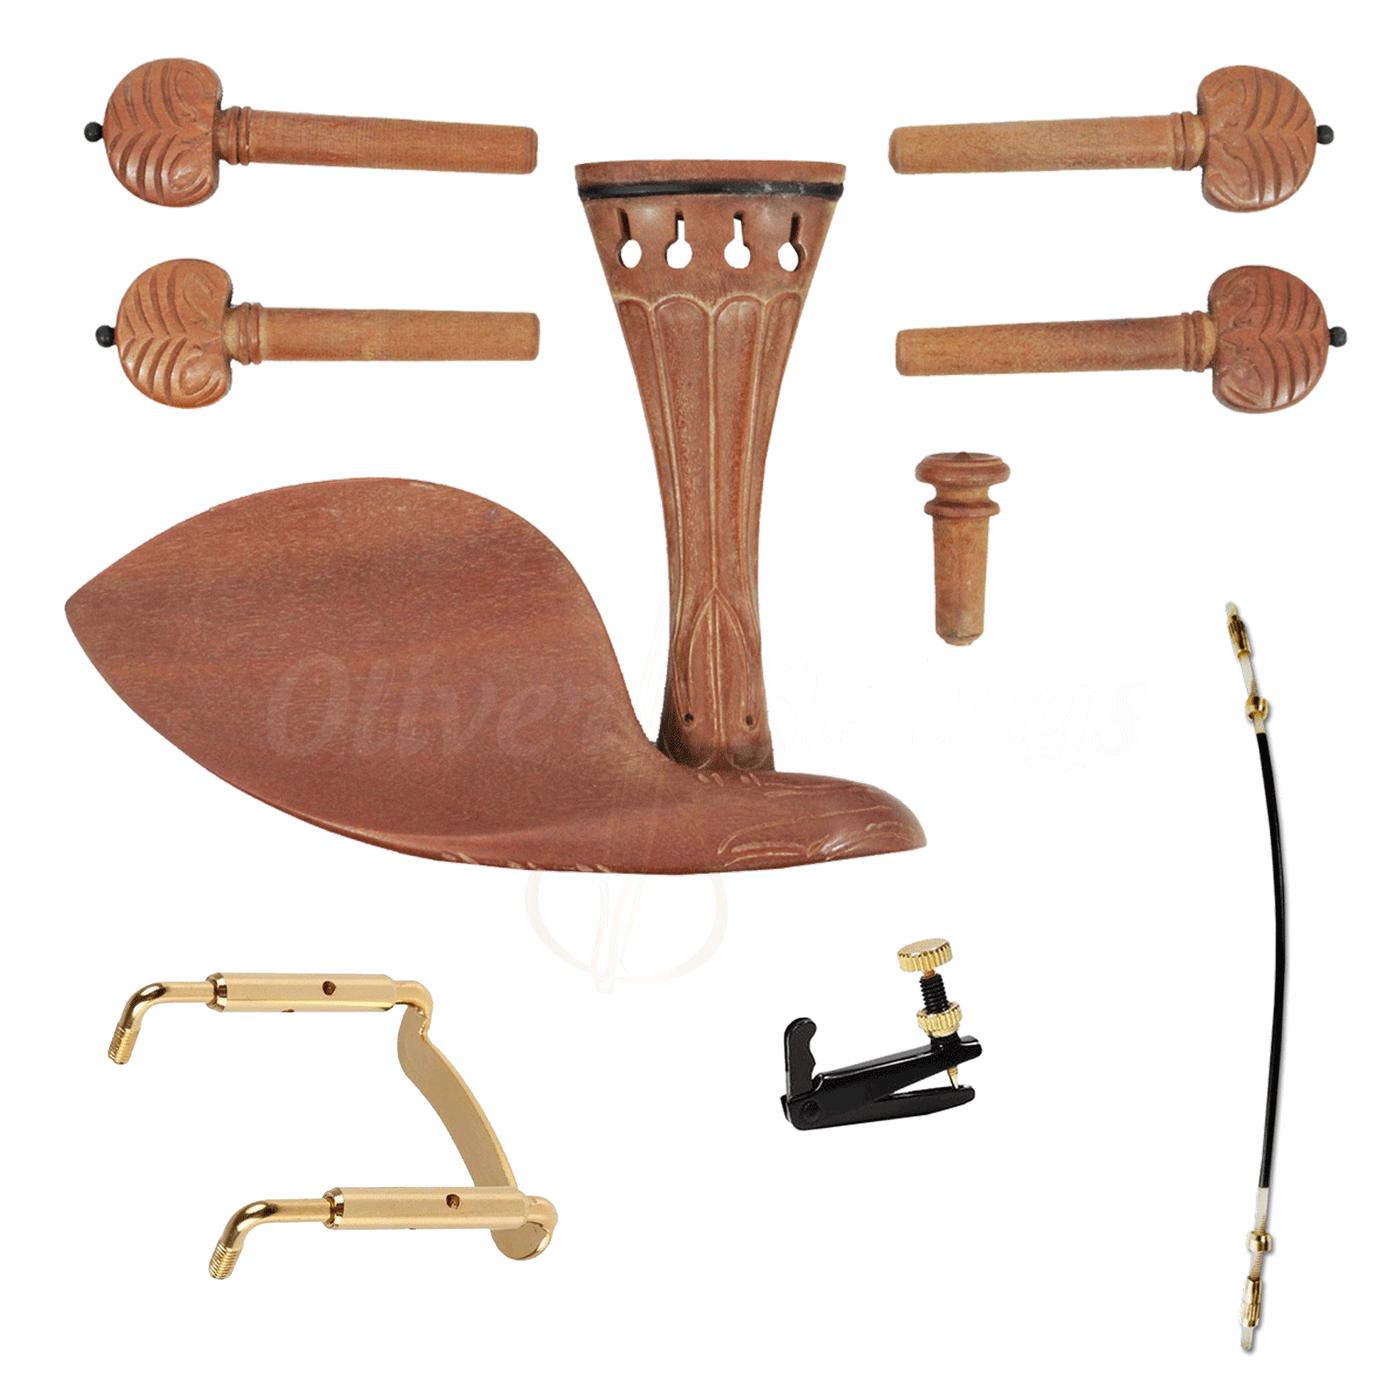 Kit de montagem Jujuba esculpido para Violino 4/4 Completo